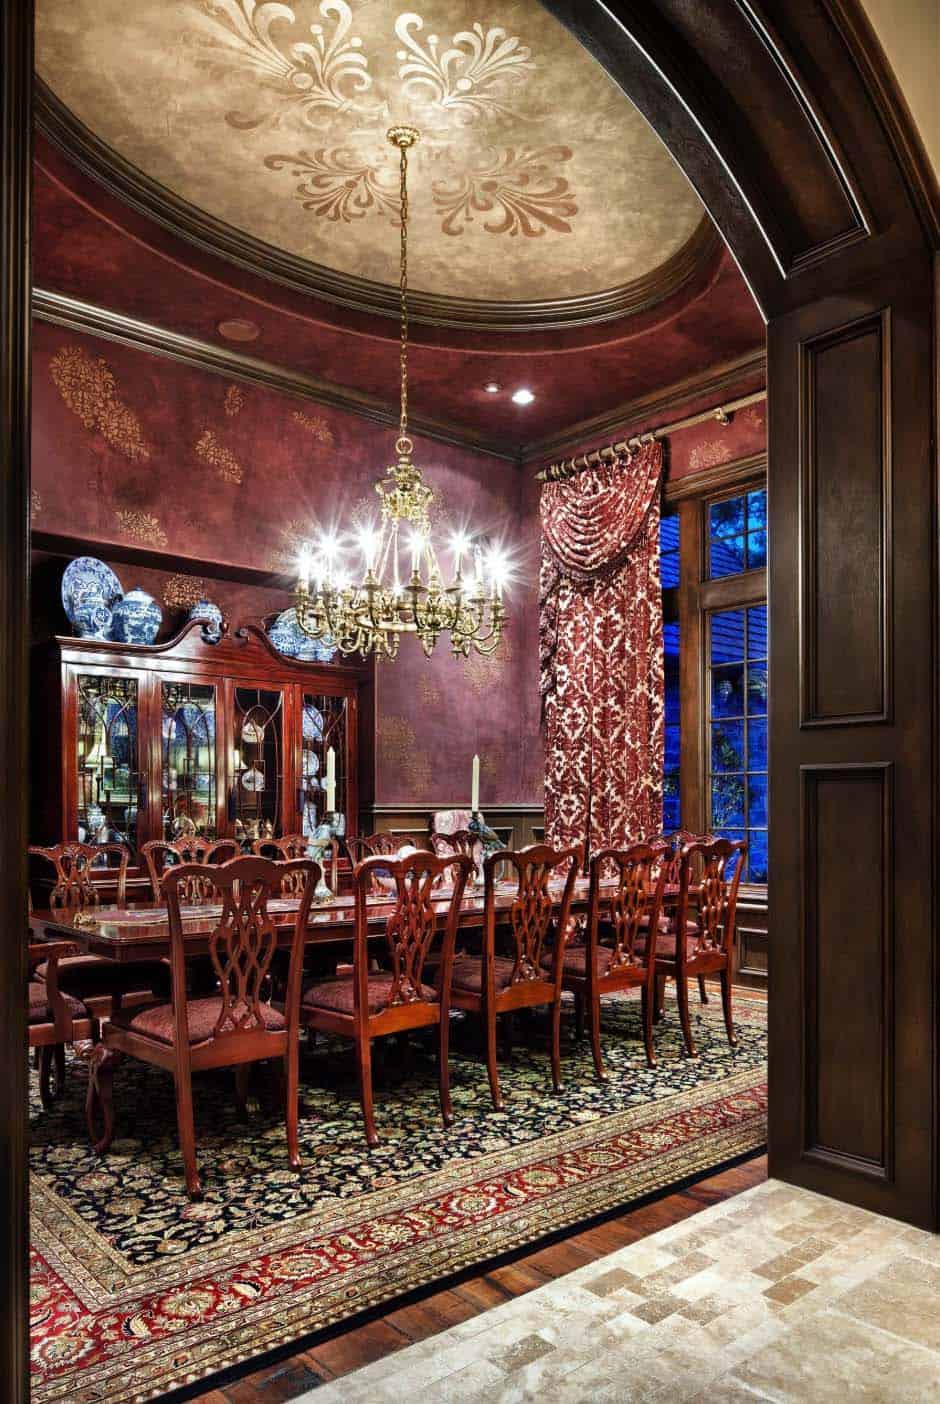 salle-a-manger-traditionnelle-manoir-anglais